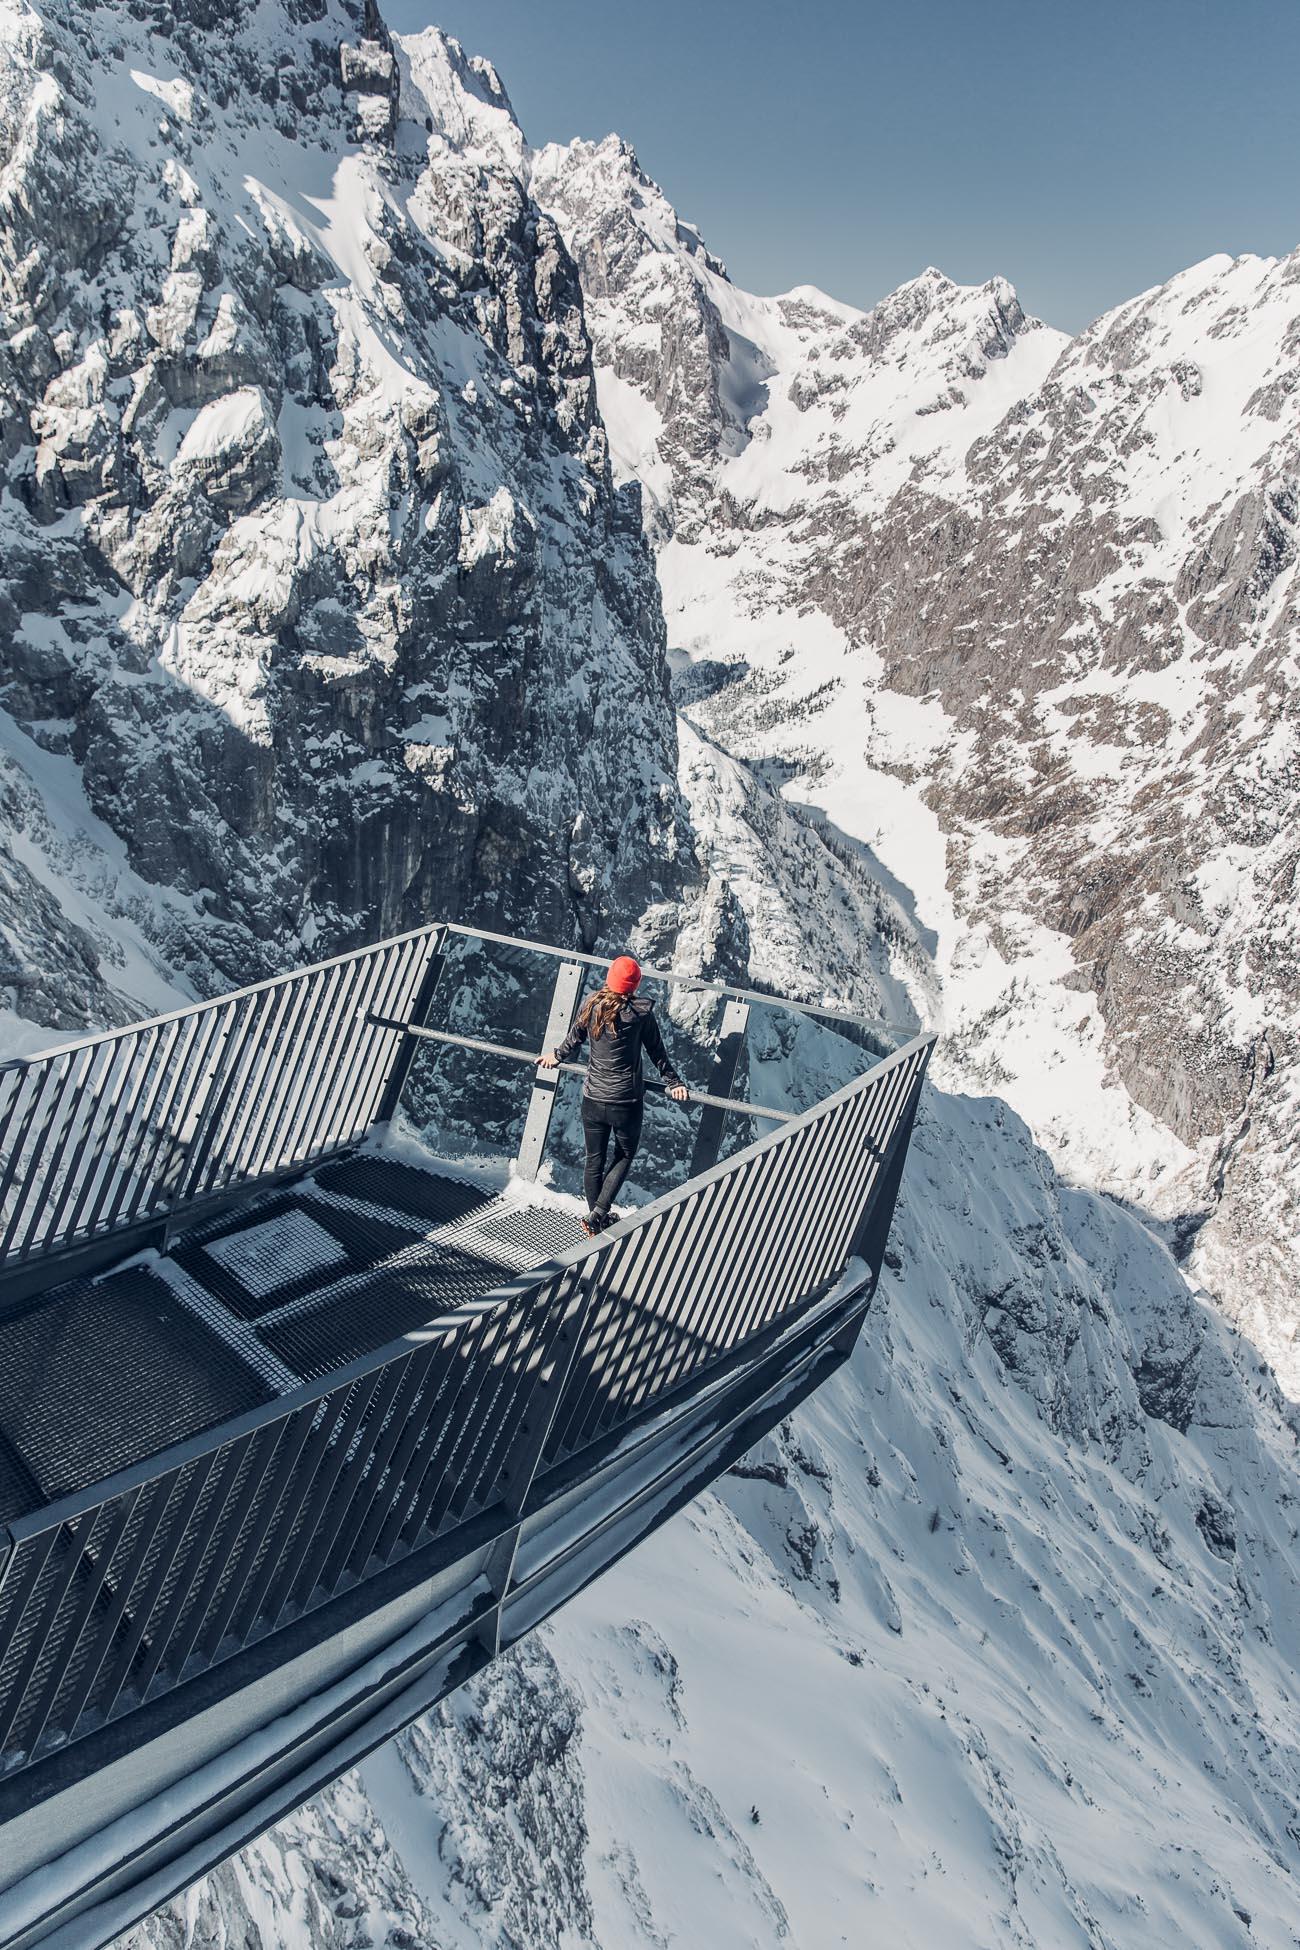 Alpspix at Zugspitze Garmisch-Partenkirchen